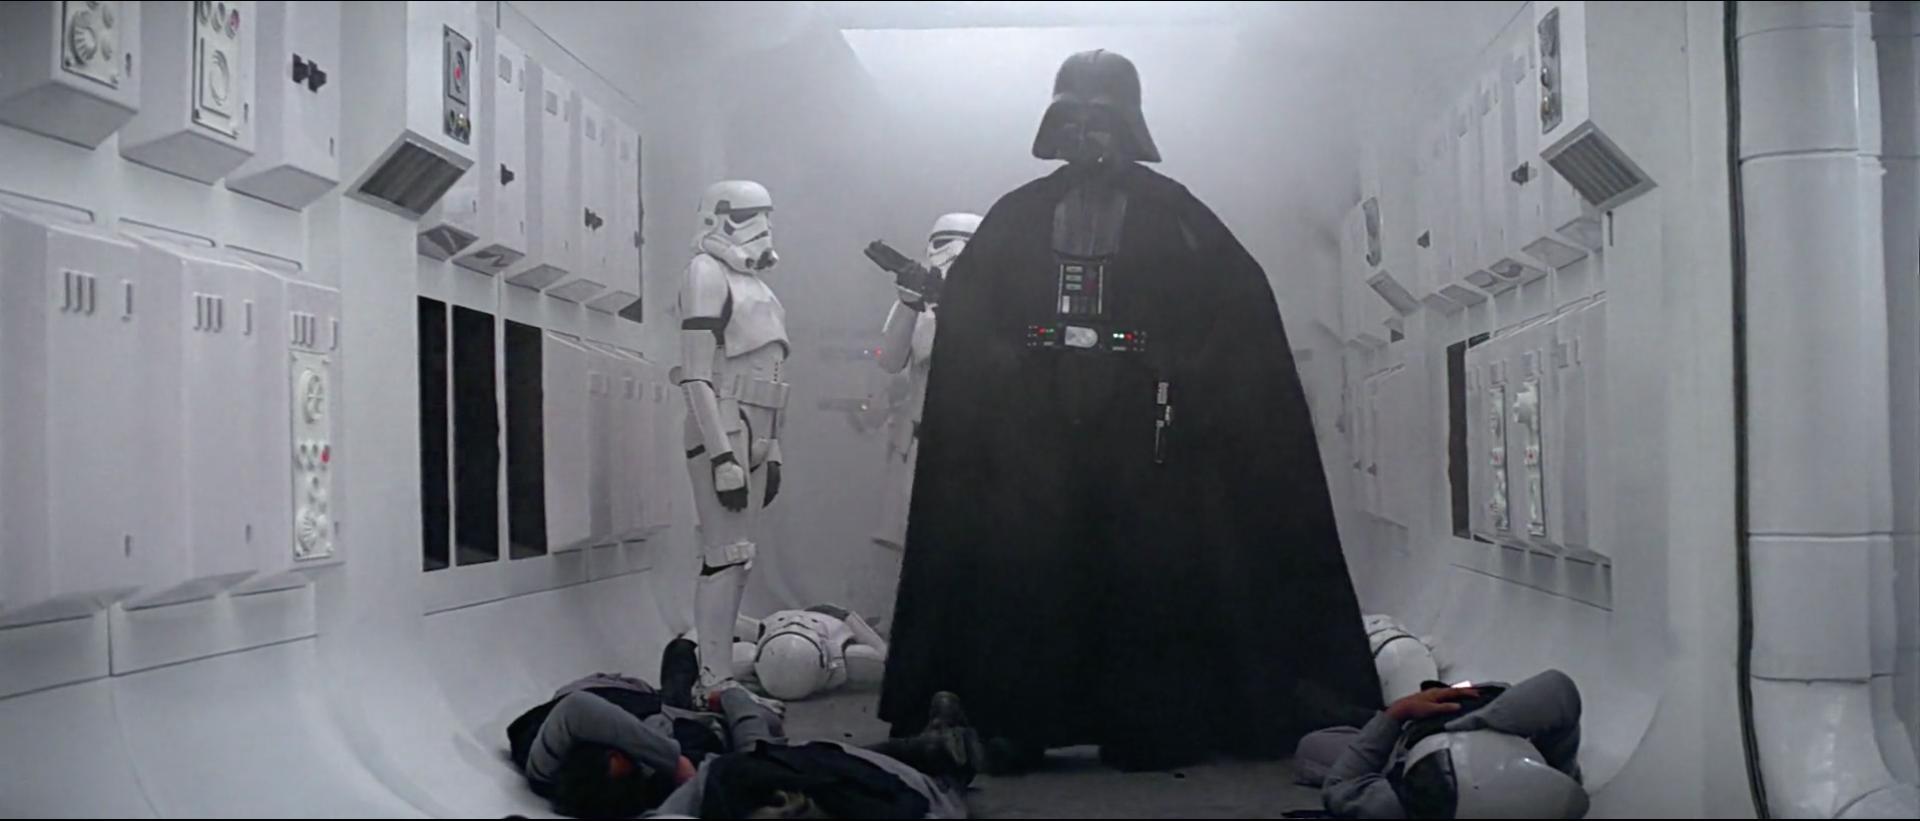 Michael Michael vs Darth Vader